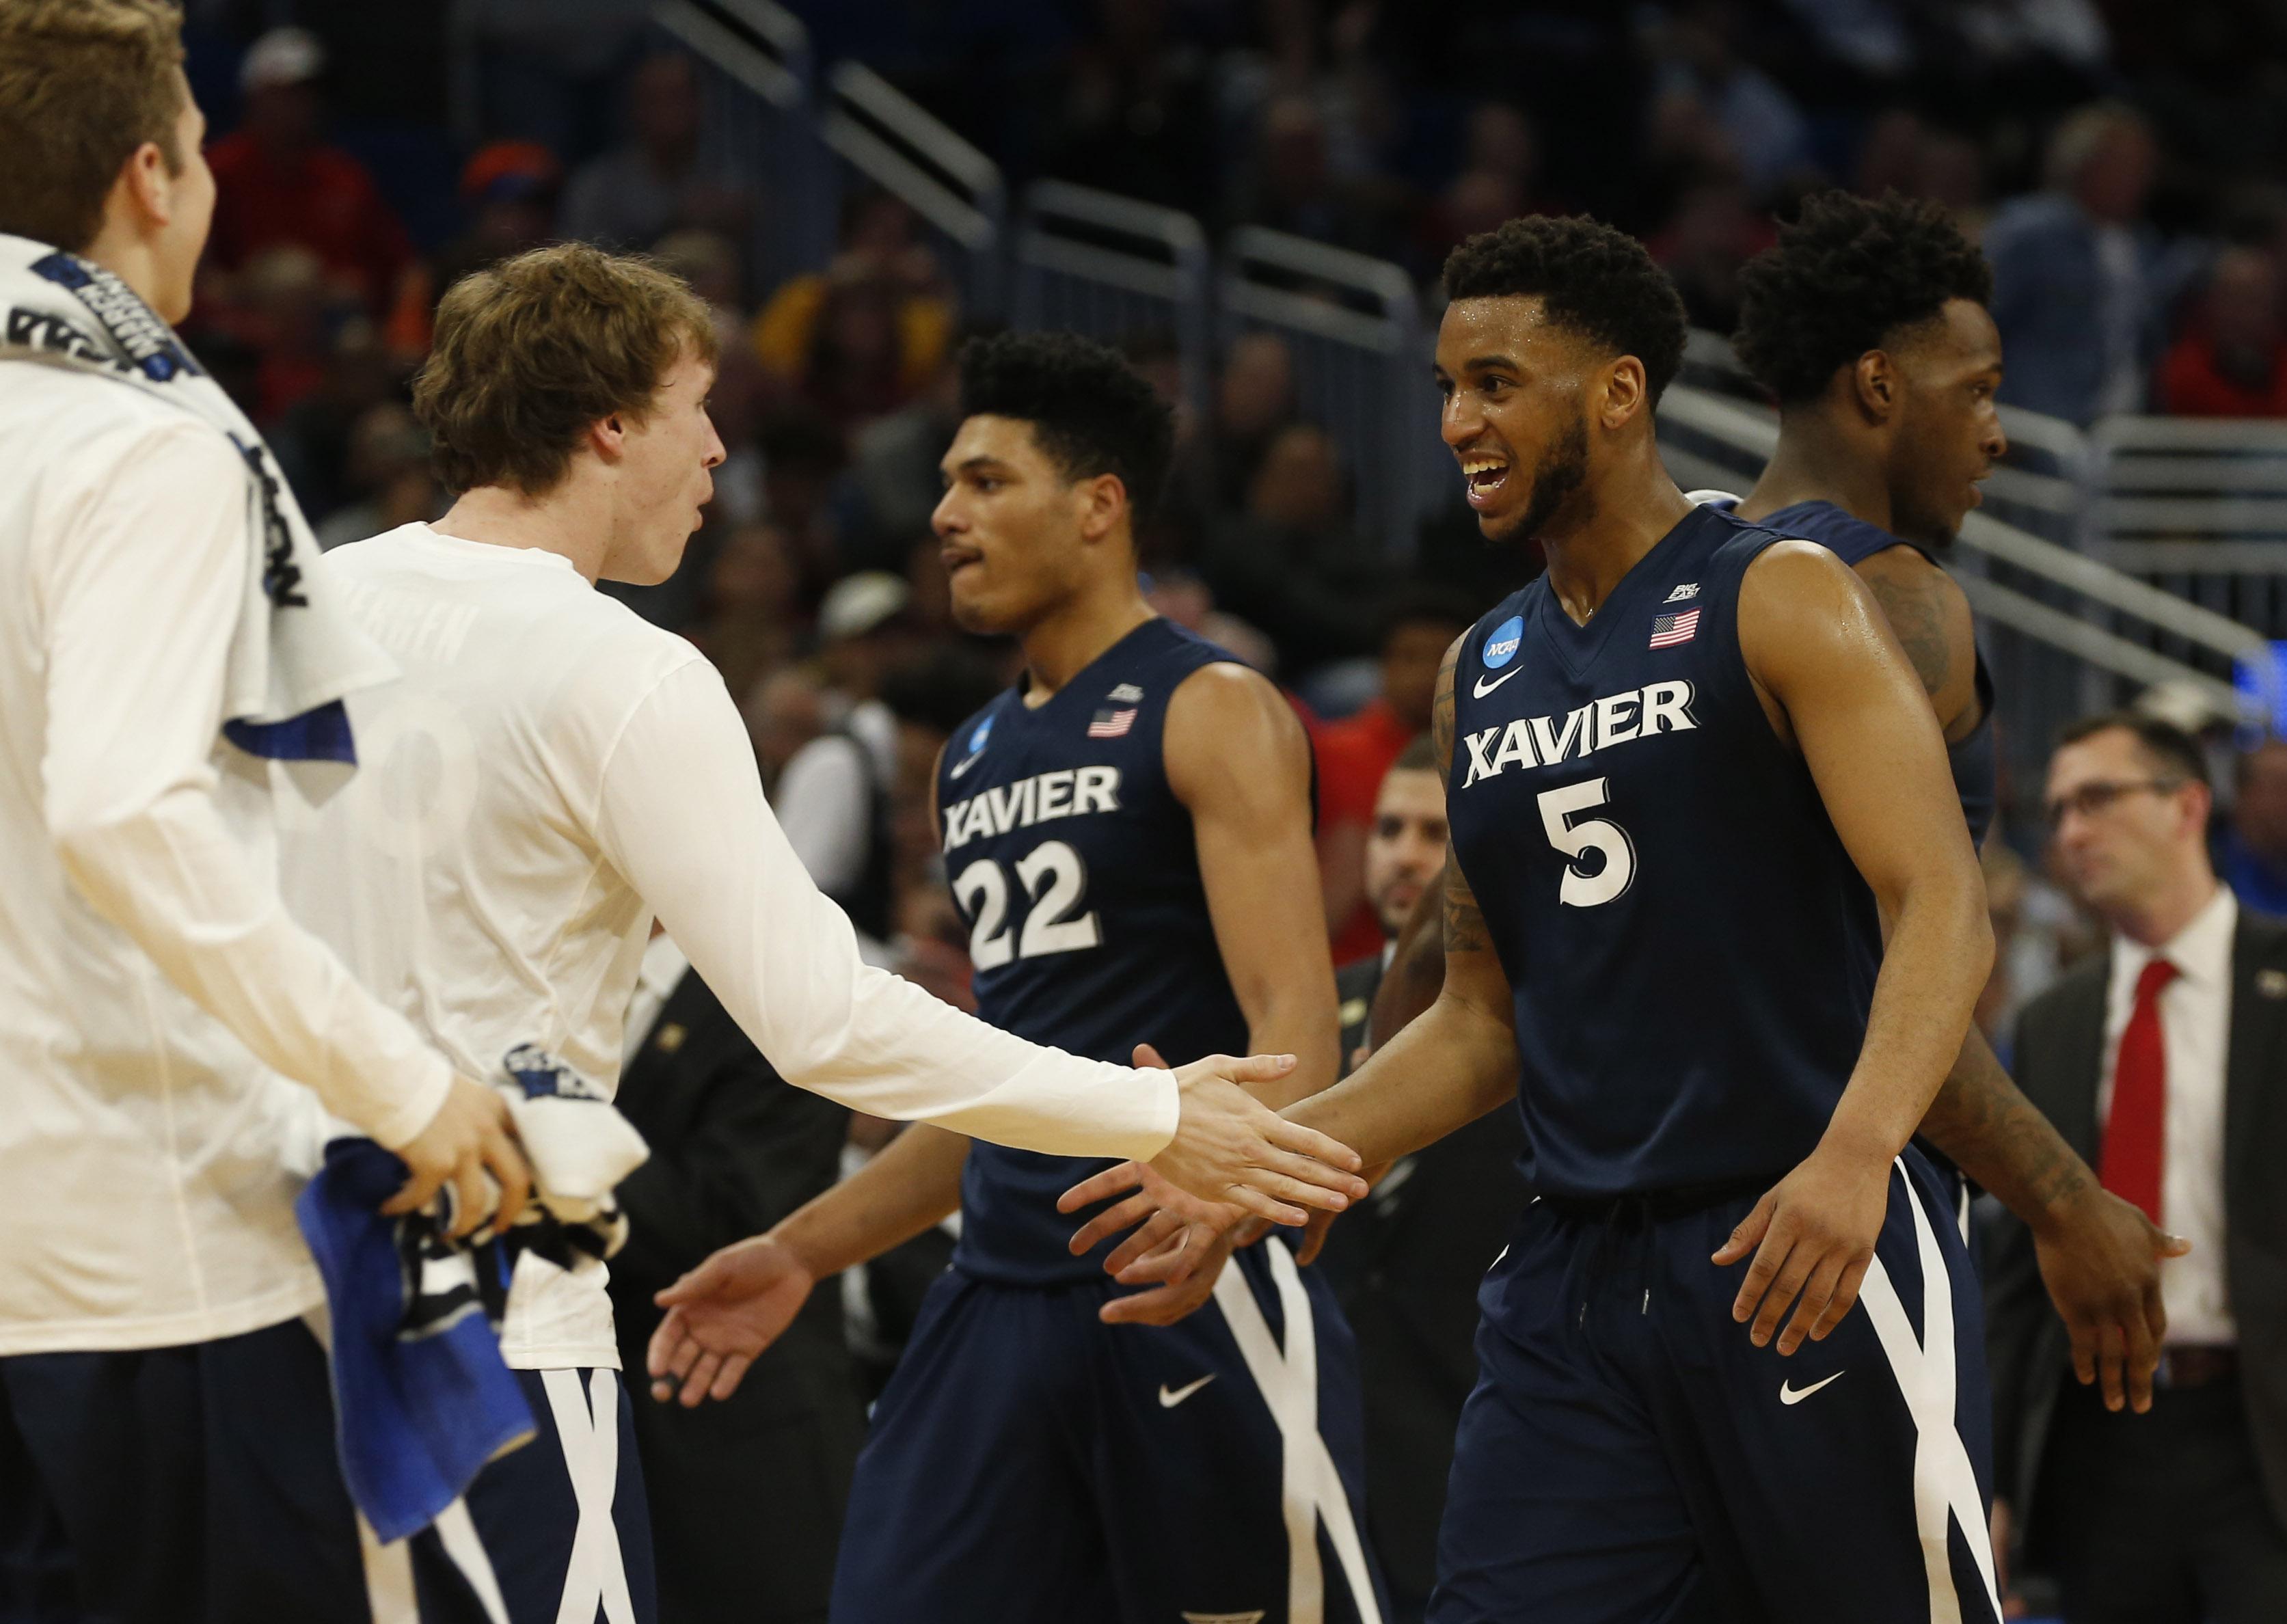 NCAA Tournament 2017, Maryland vs Xavier: Highlights, score and recap